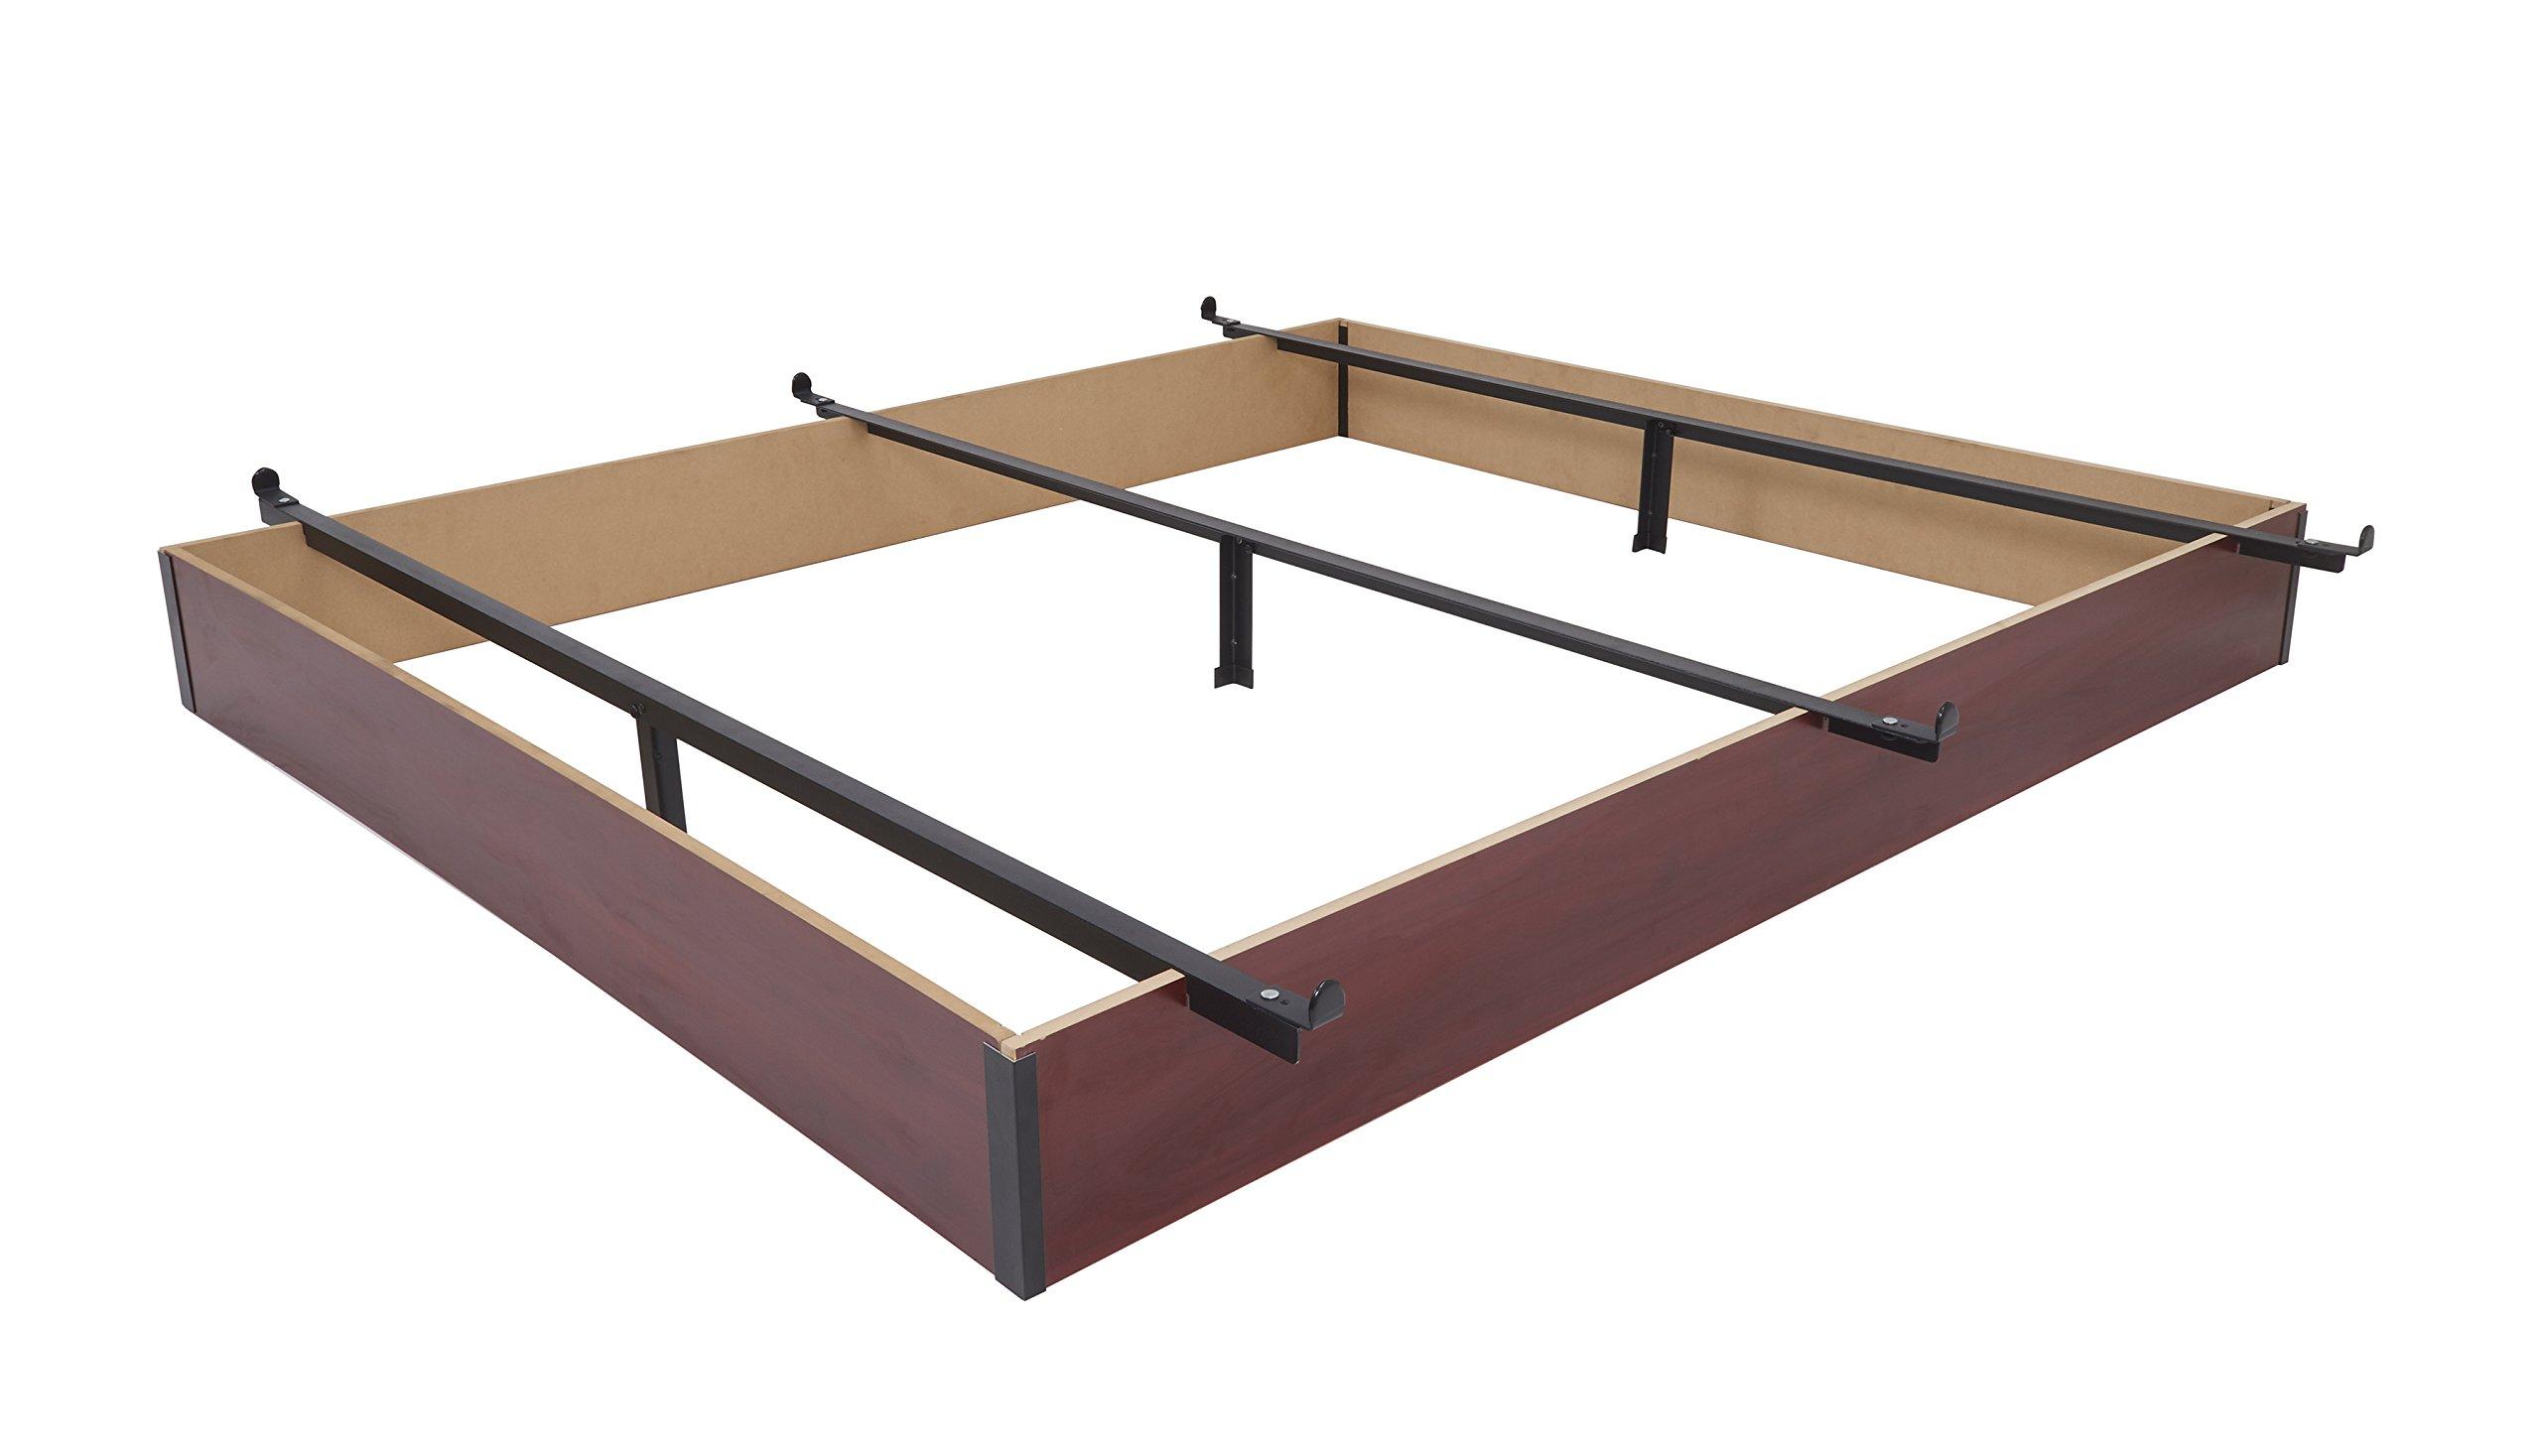 Mantua Wood Bed Base, Full, Cherry Finish, C75WB46 N by Mantua